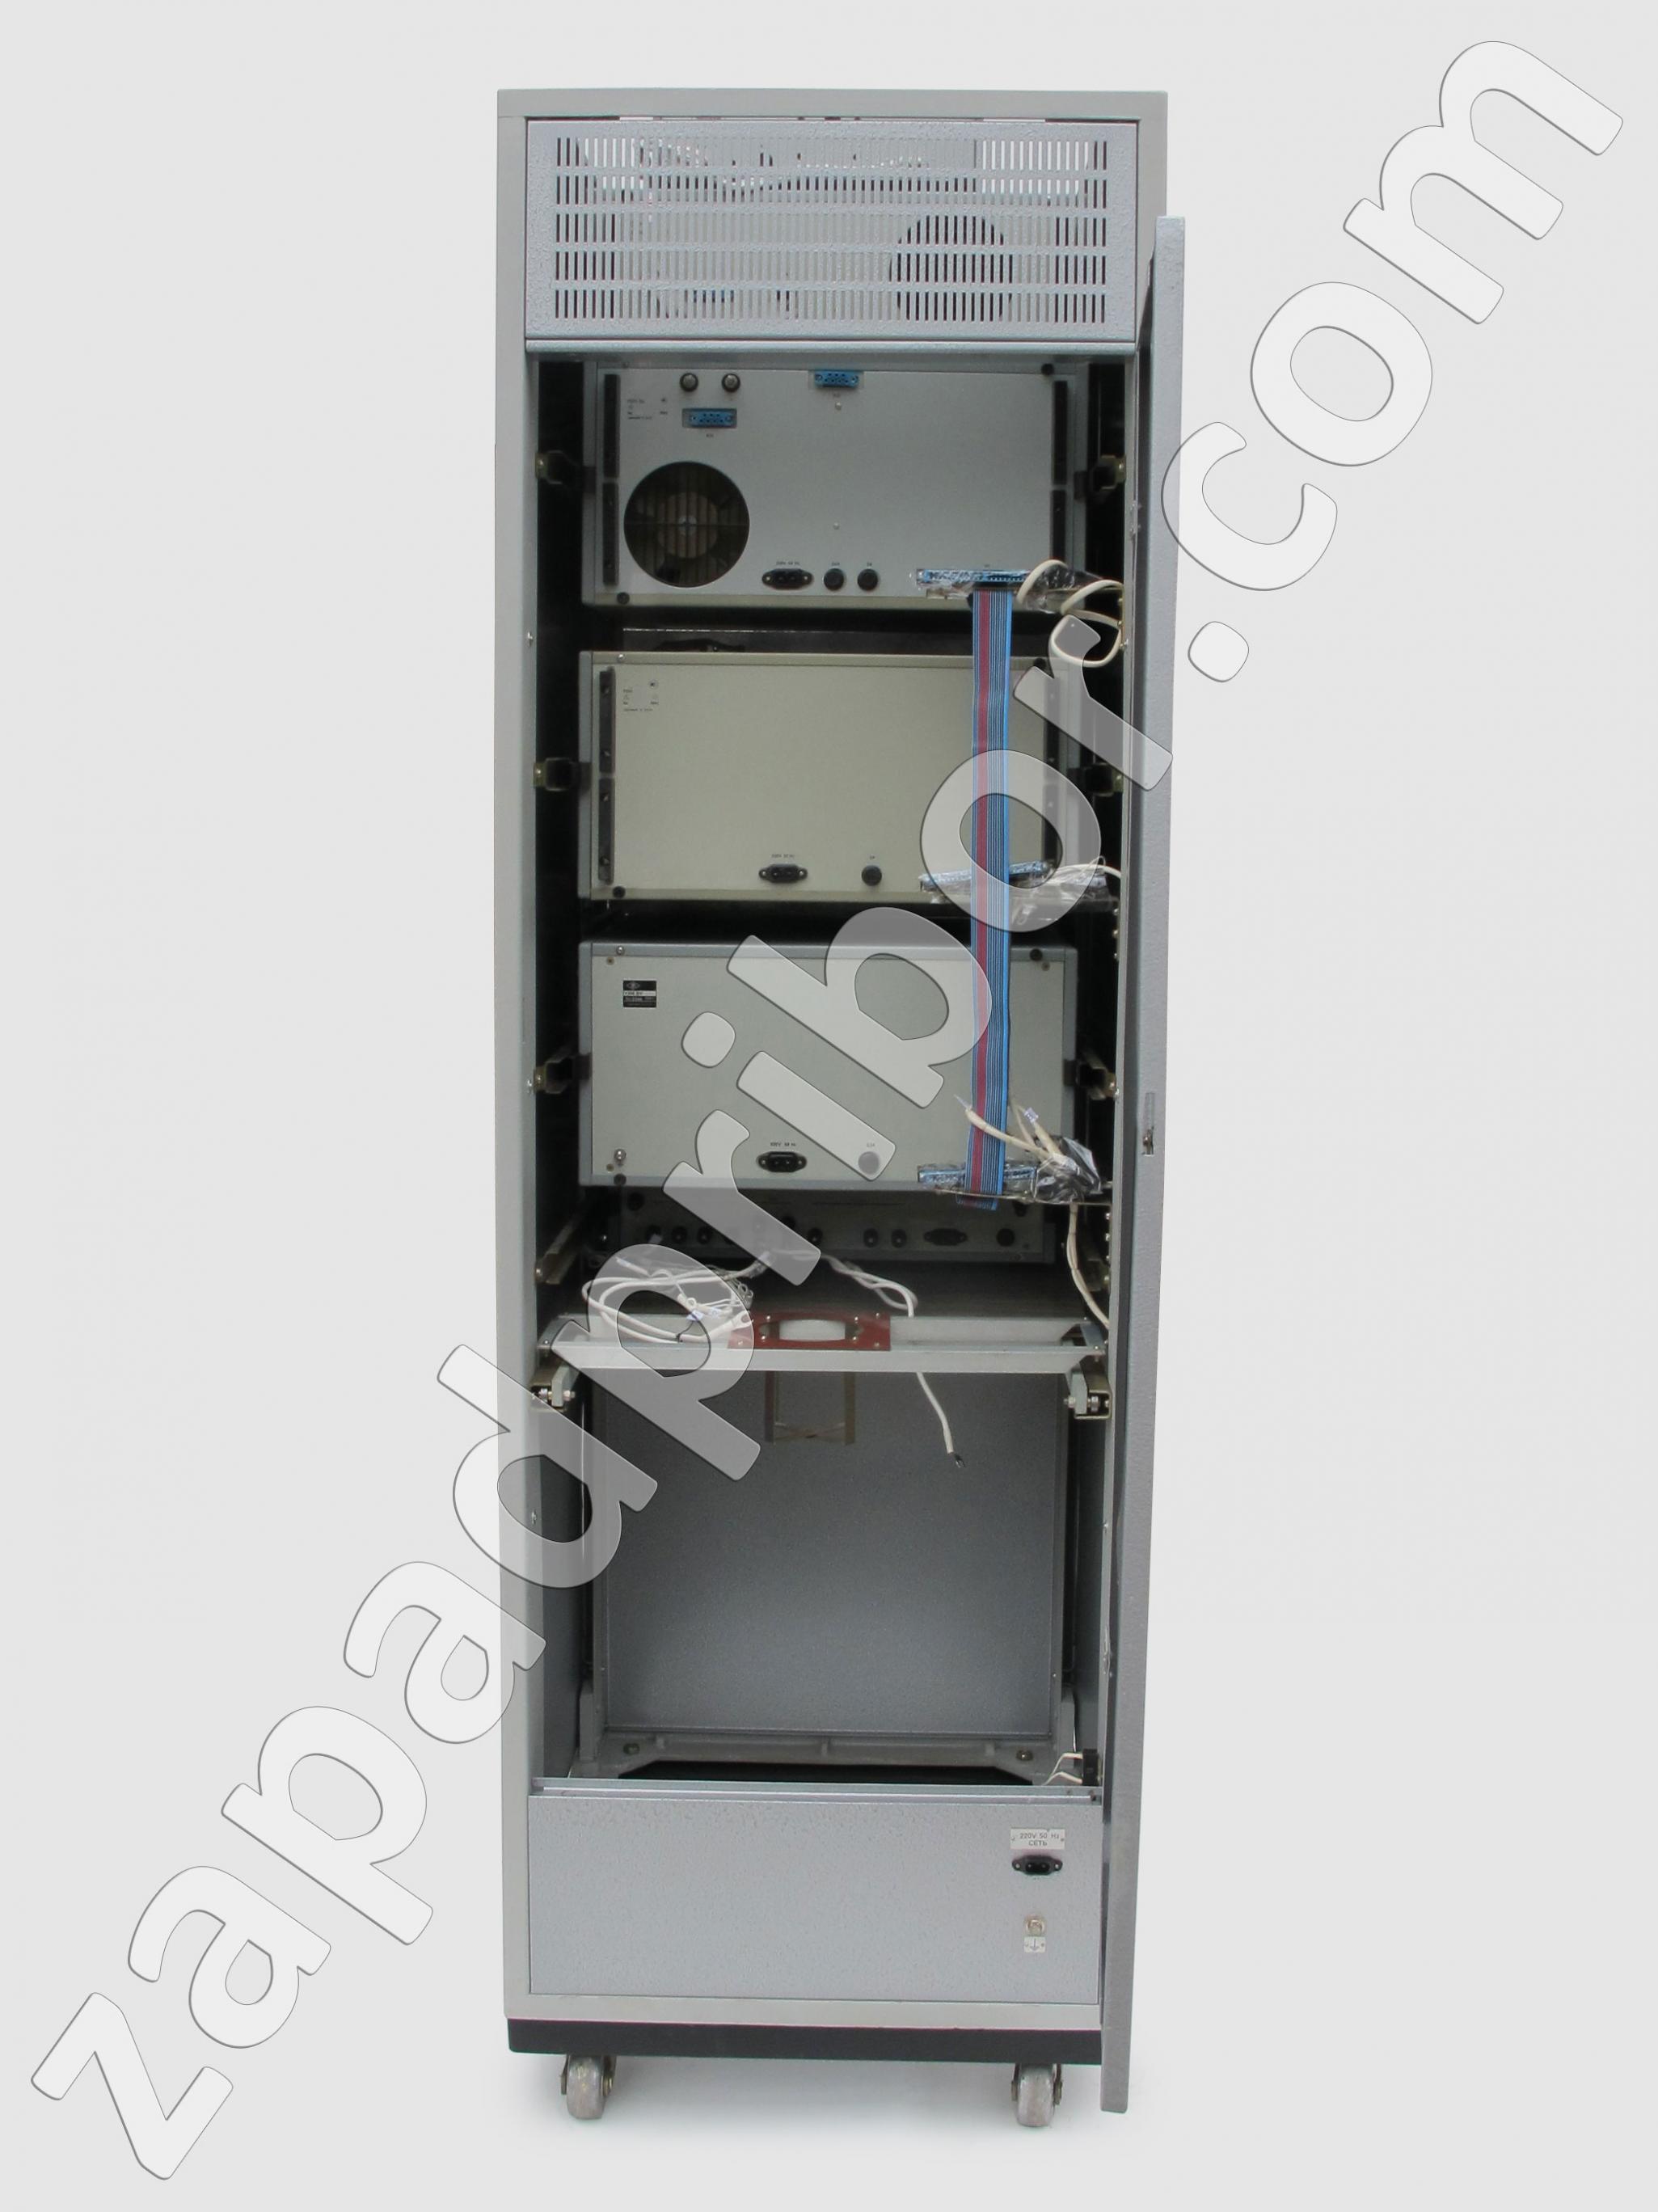 схема установки тэ-16